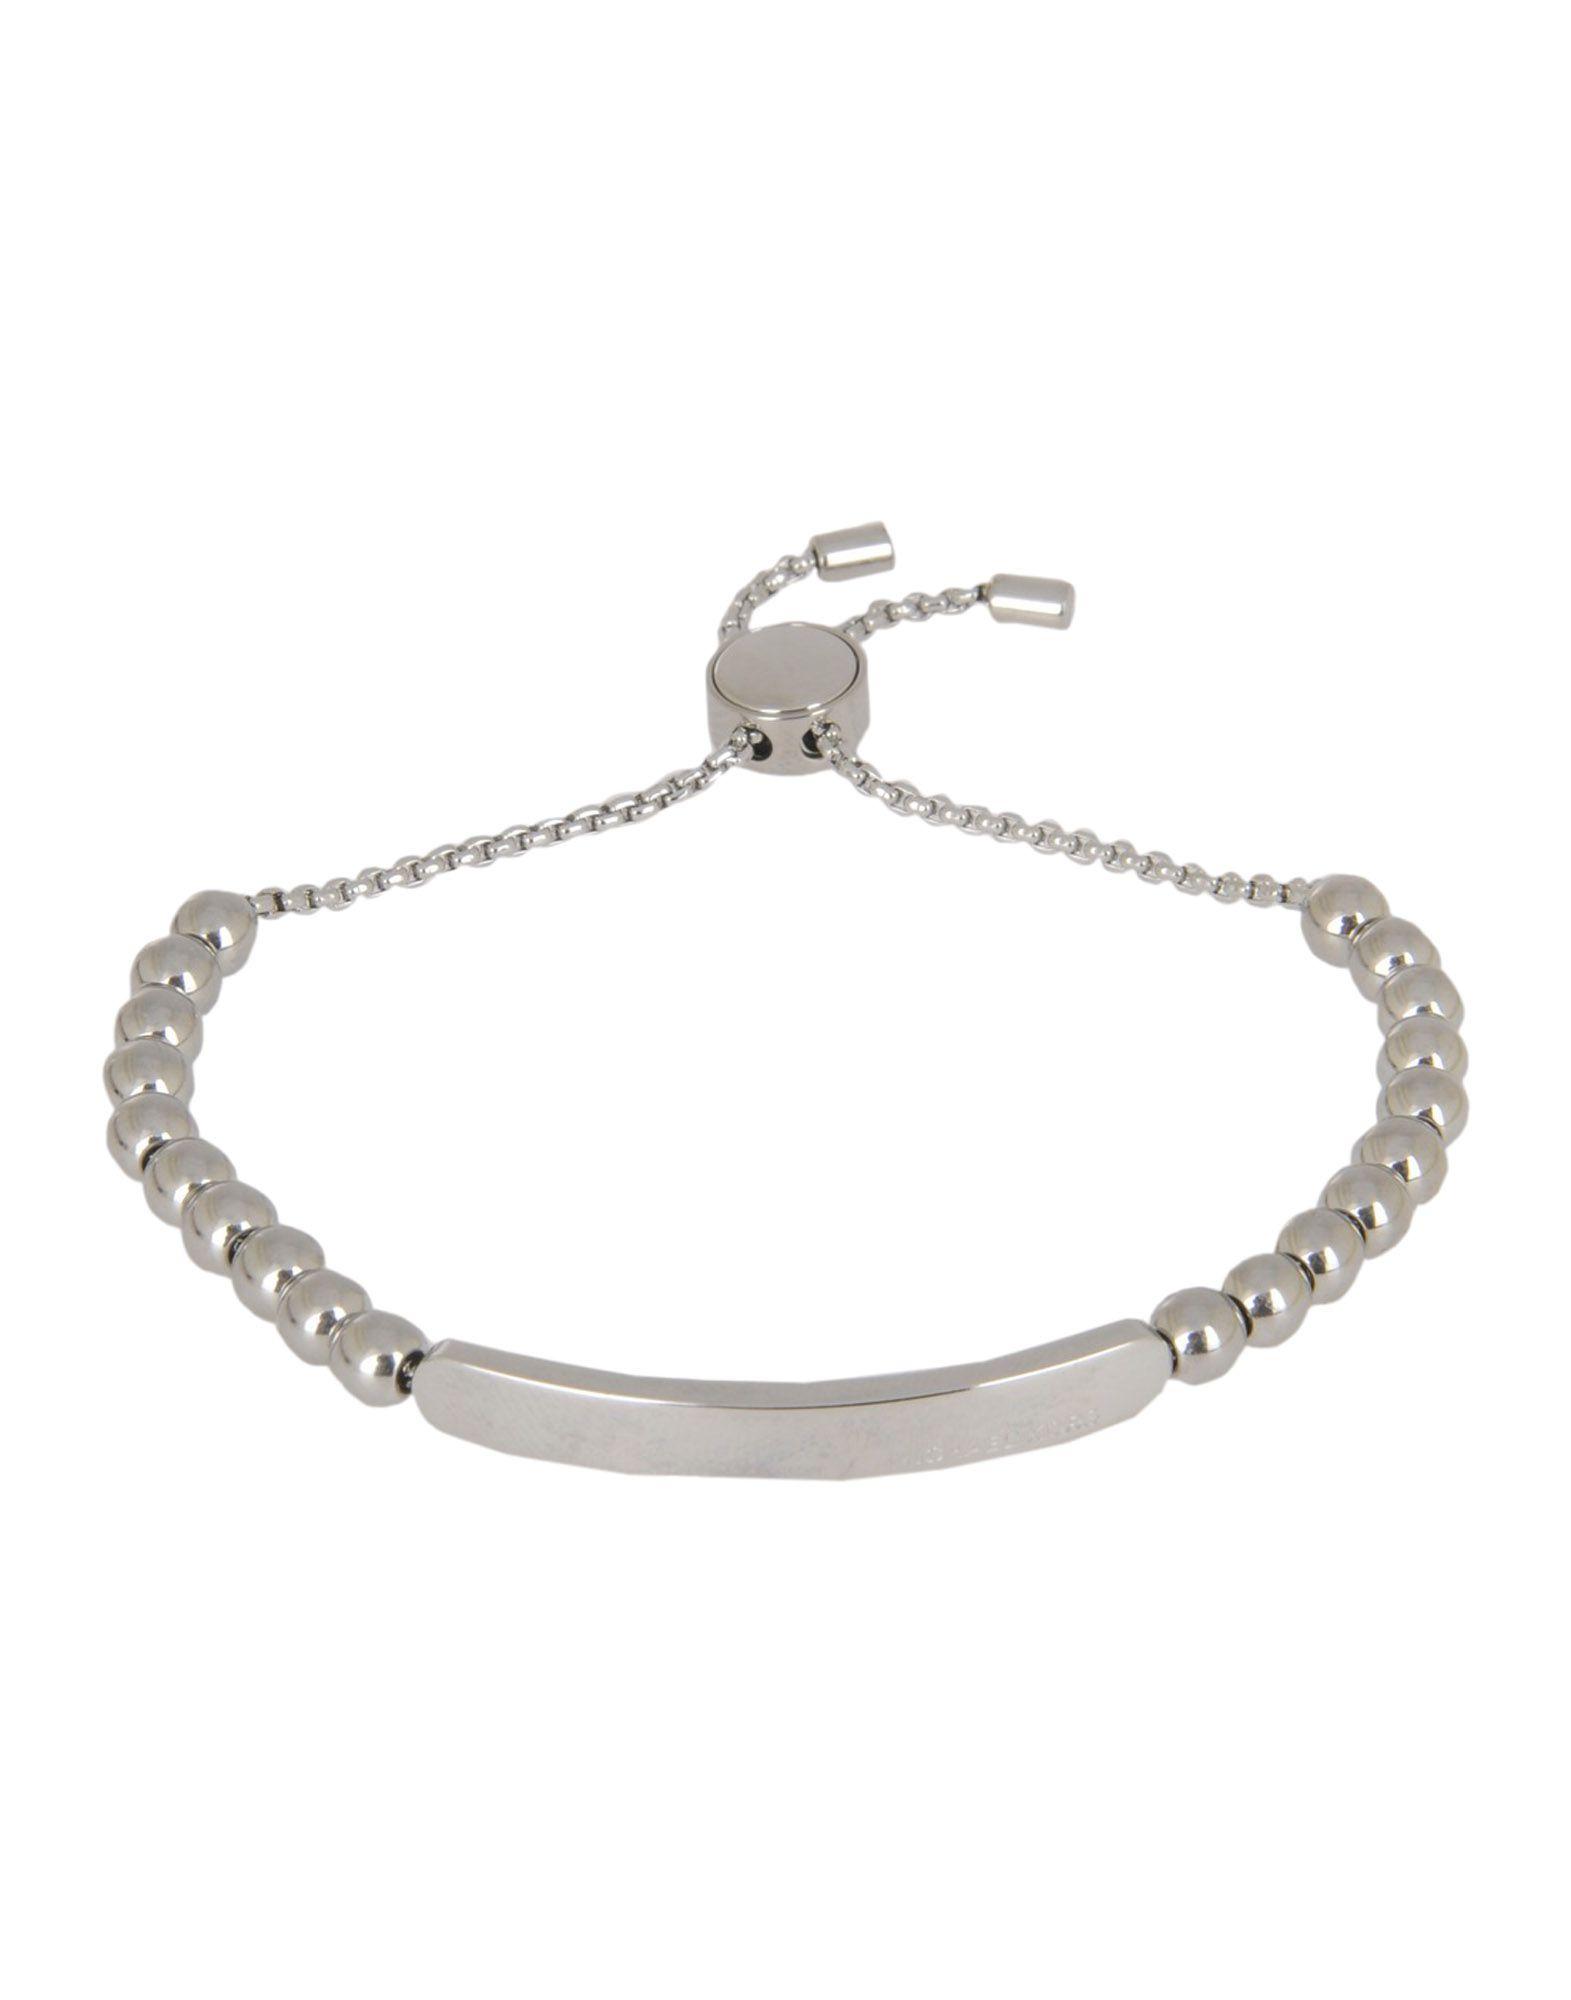 Titti Peggy JEWELRY - Bracelets su YOOX.COM sCJEK1LlOA